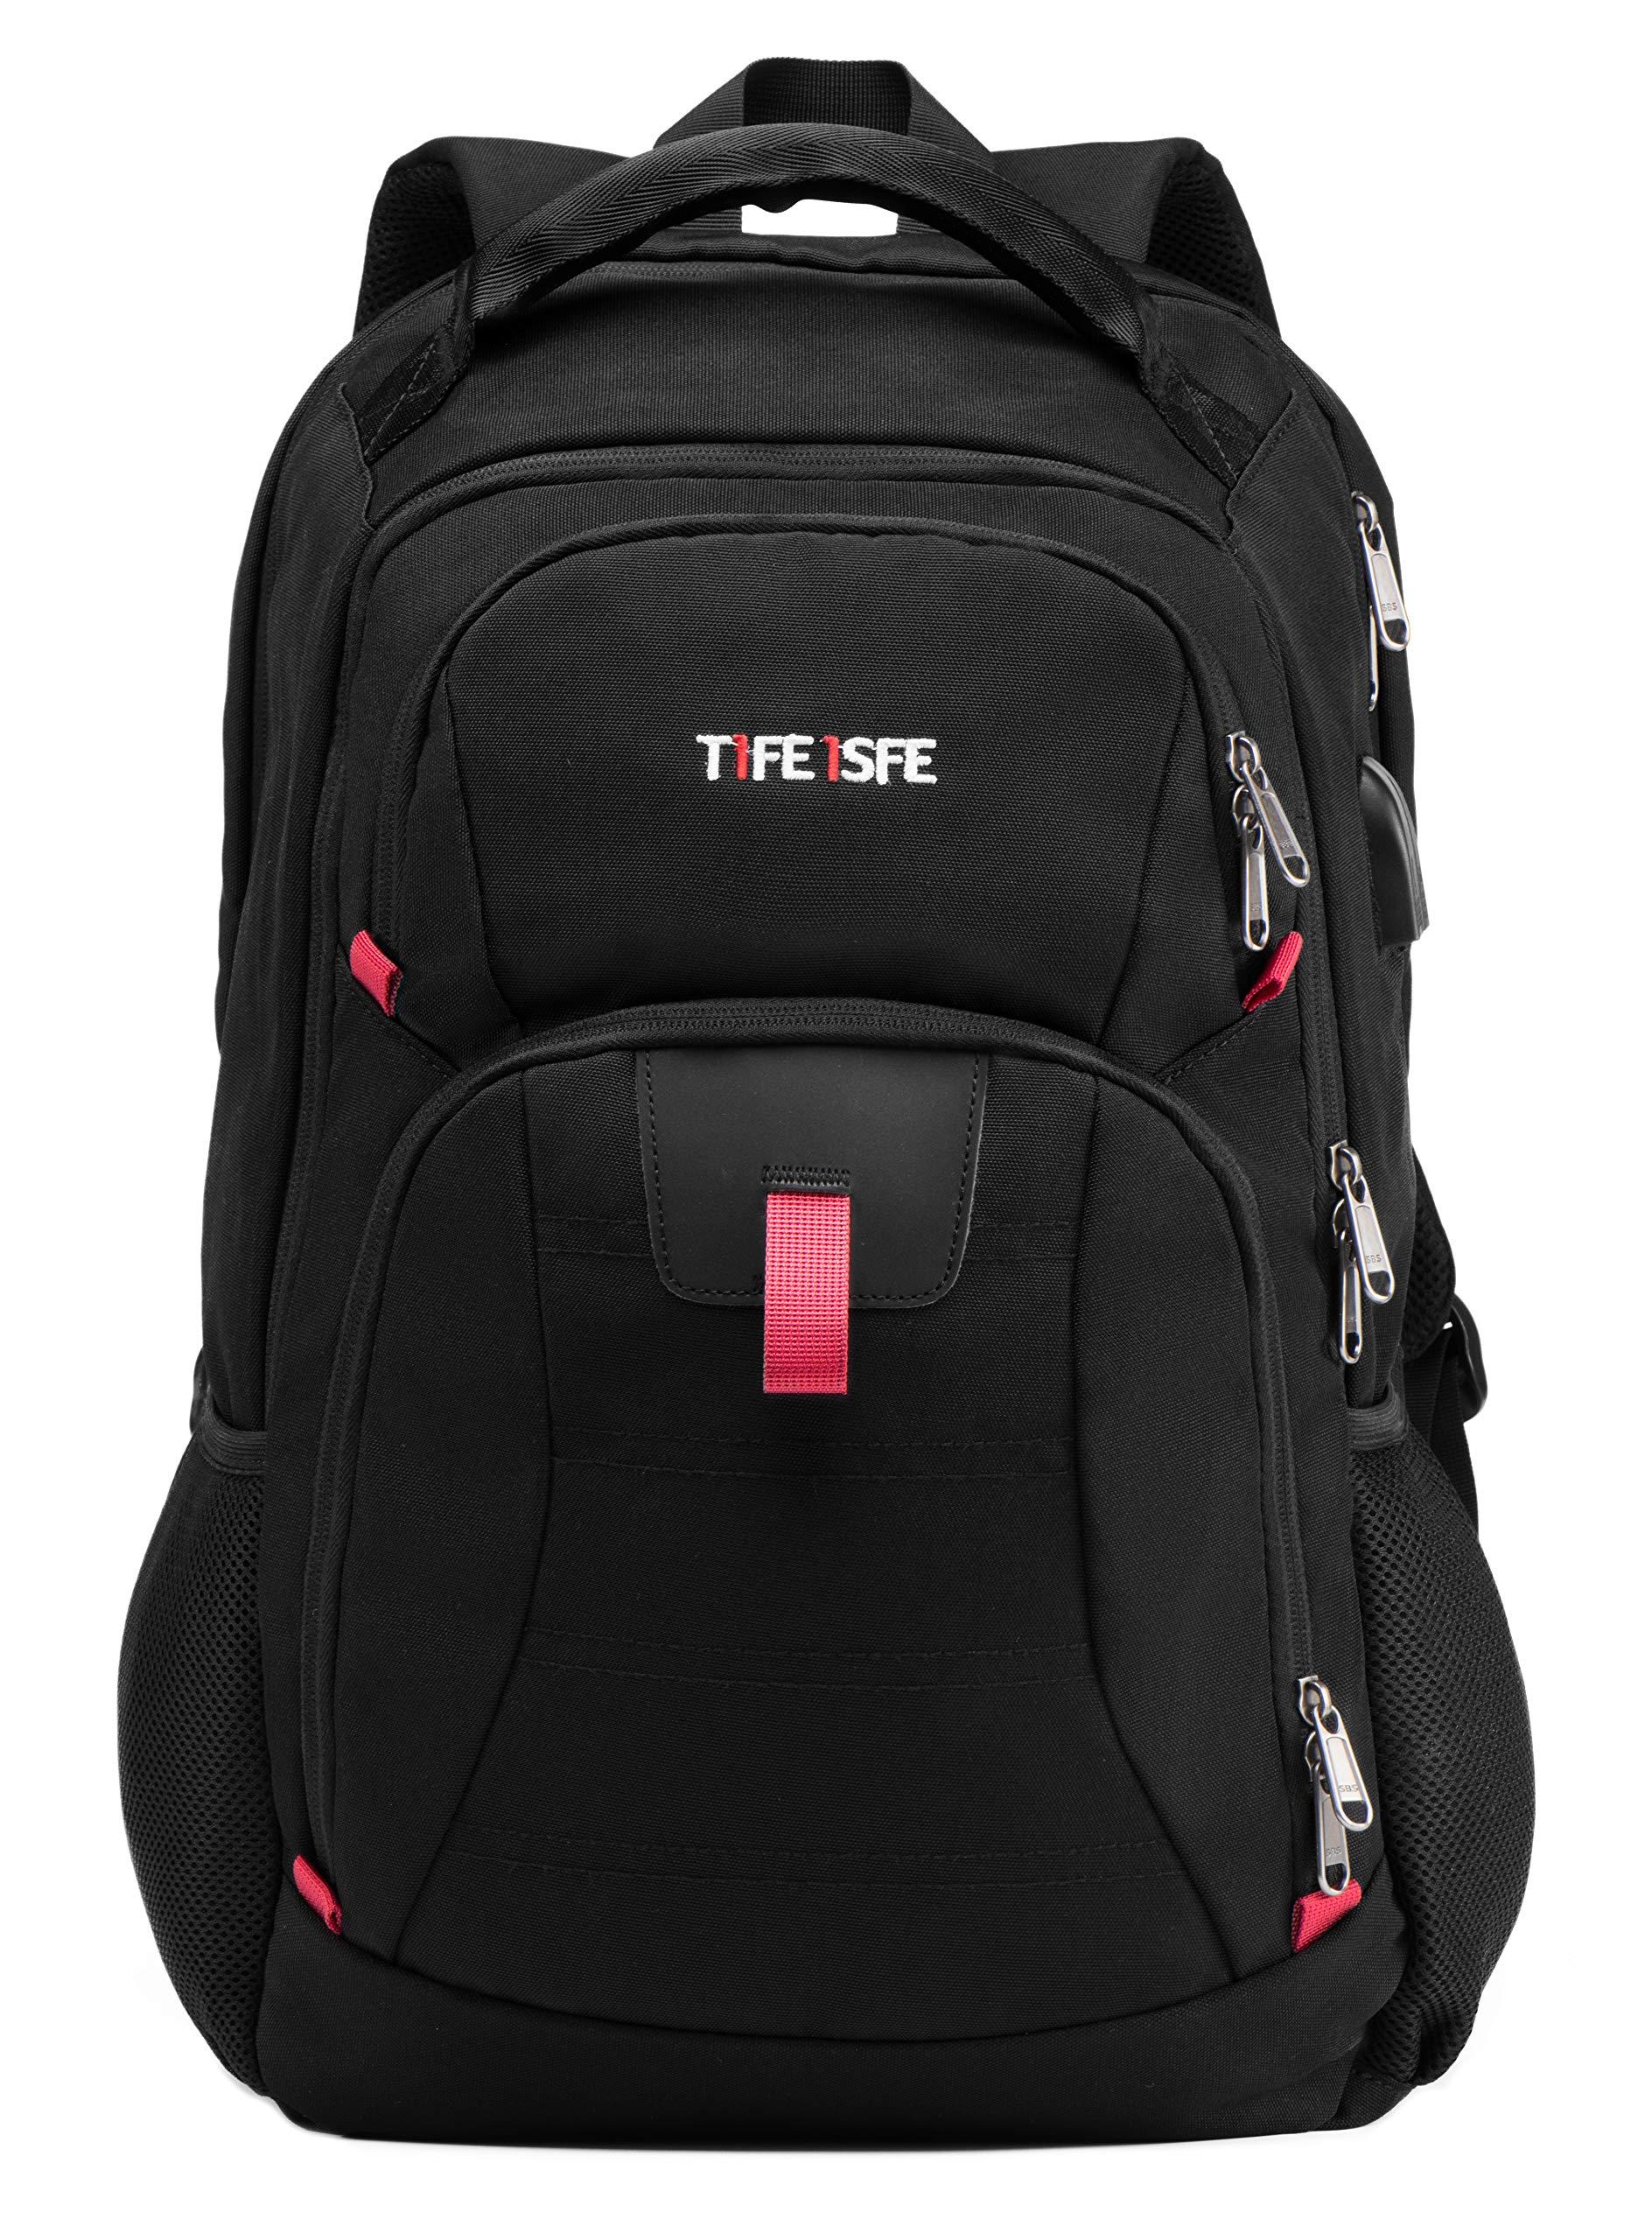 T1FE 1SFE 1811-B 19''/40L X Large Business Travel Laptop Backpack | College Book Bag | 4 Compartments' Casual Daypack | TSA ScanSmat & USB Charging & Earphone Plug